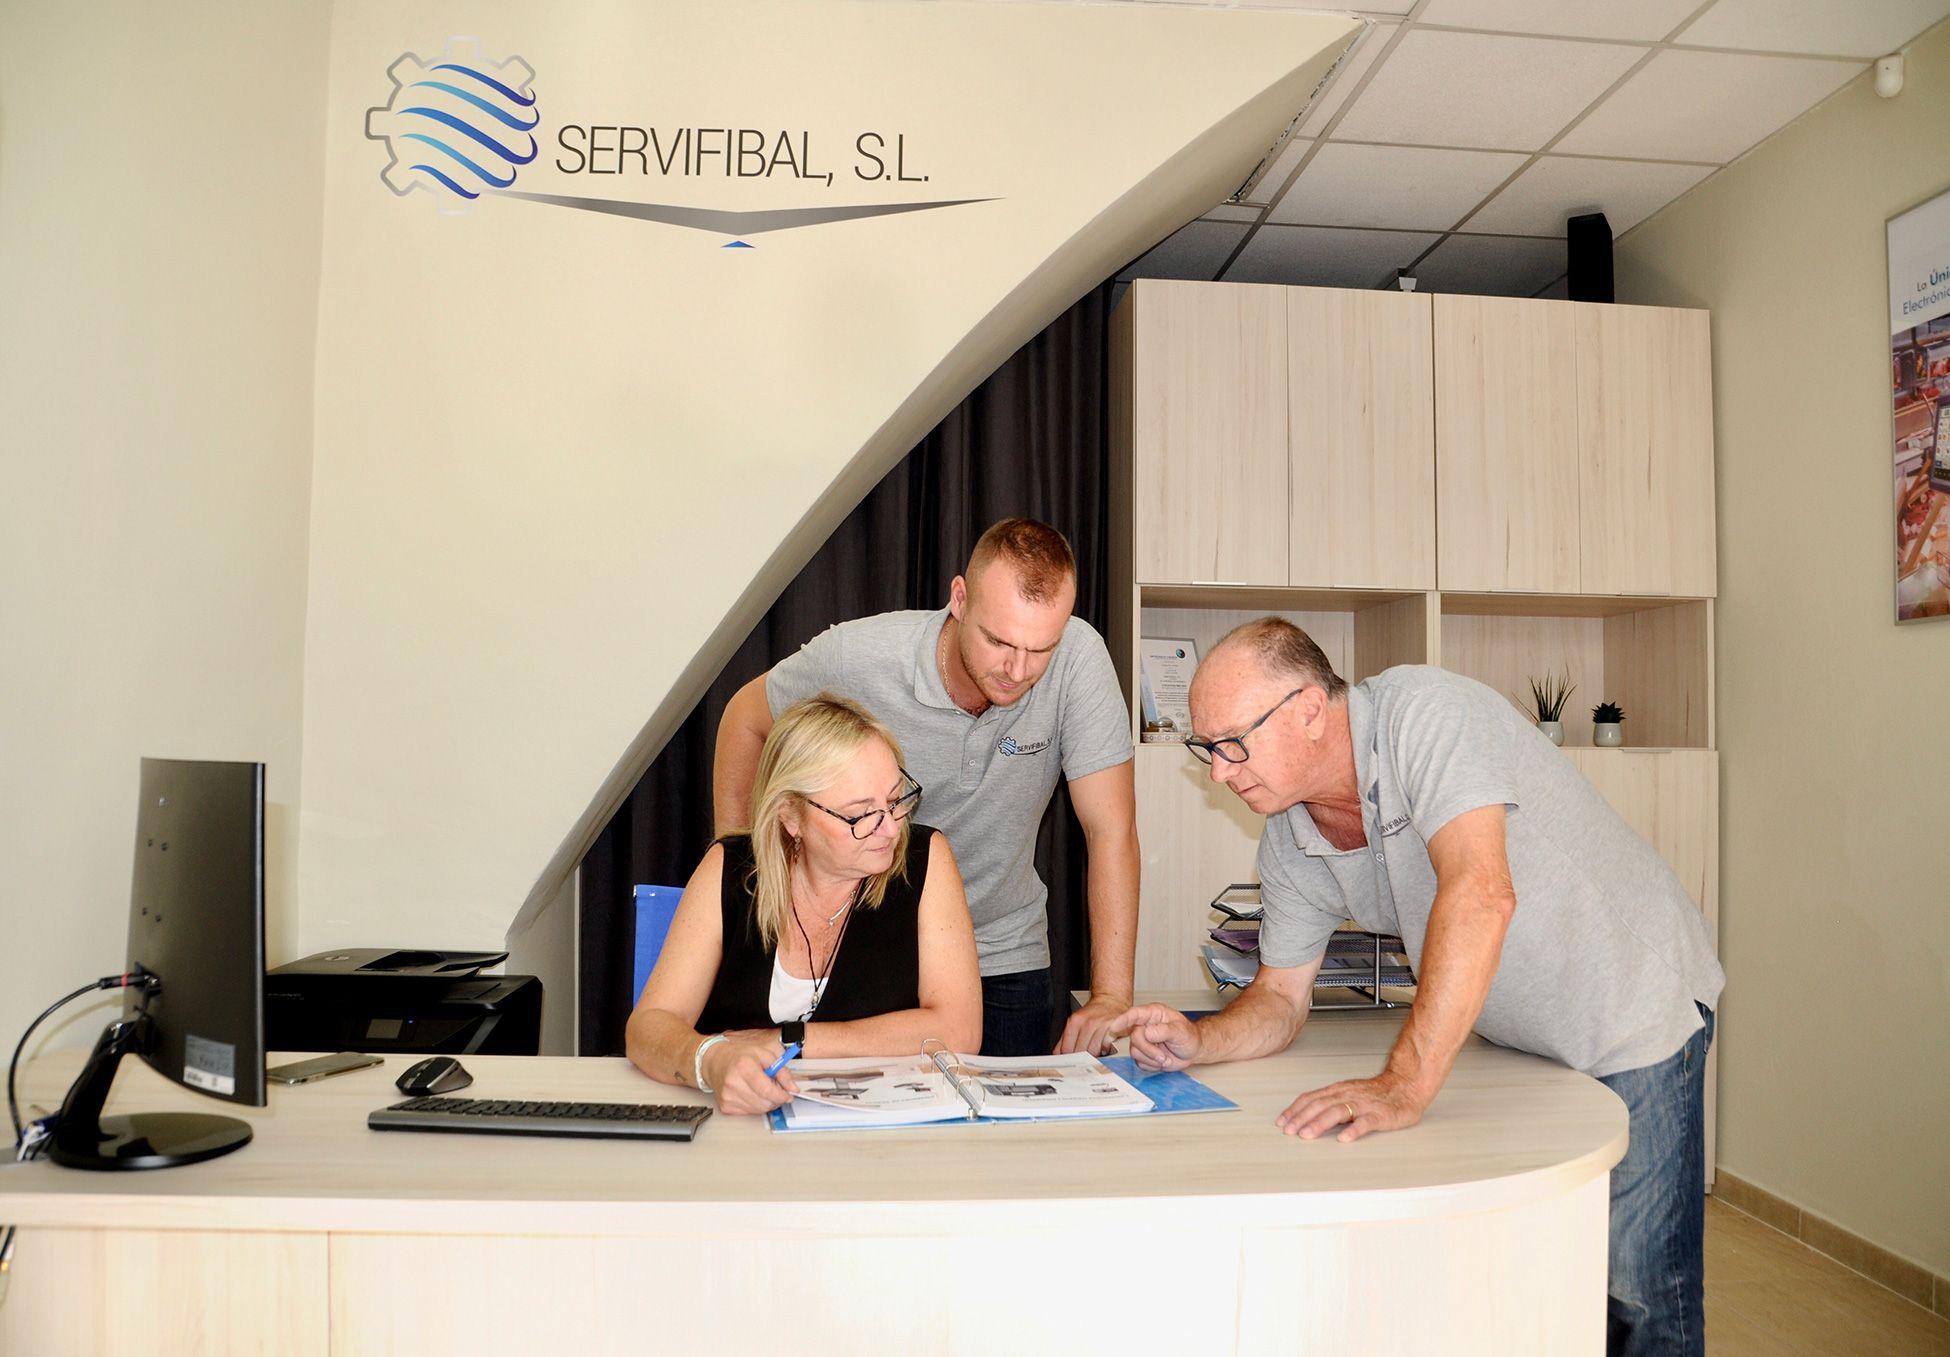 Servifibal